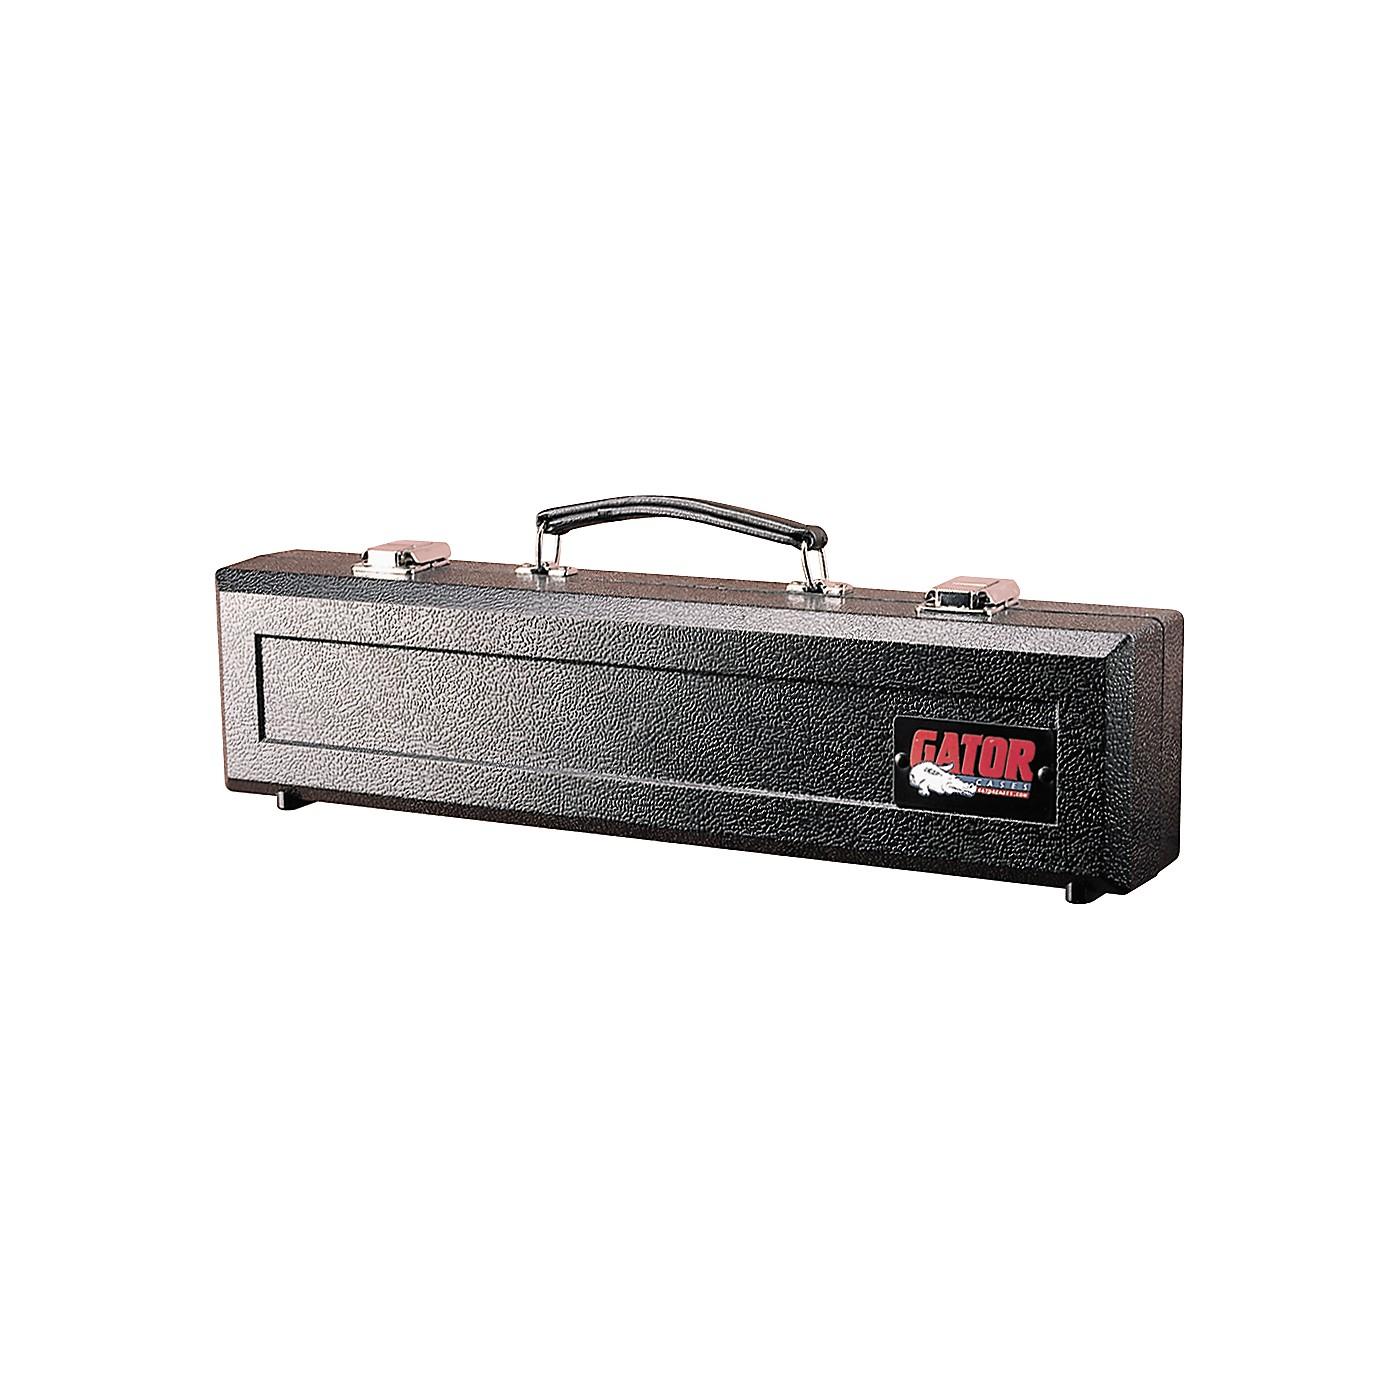 Gator GC Series Deluxe ABS Flute Case thumbnail